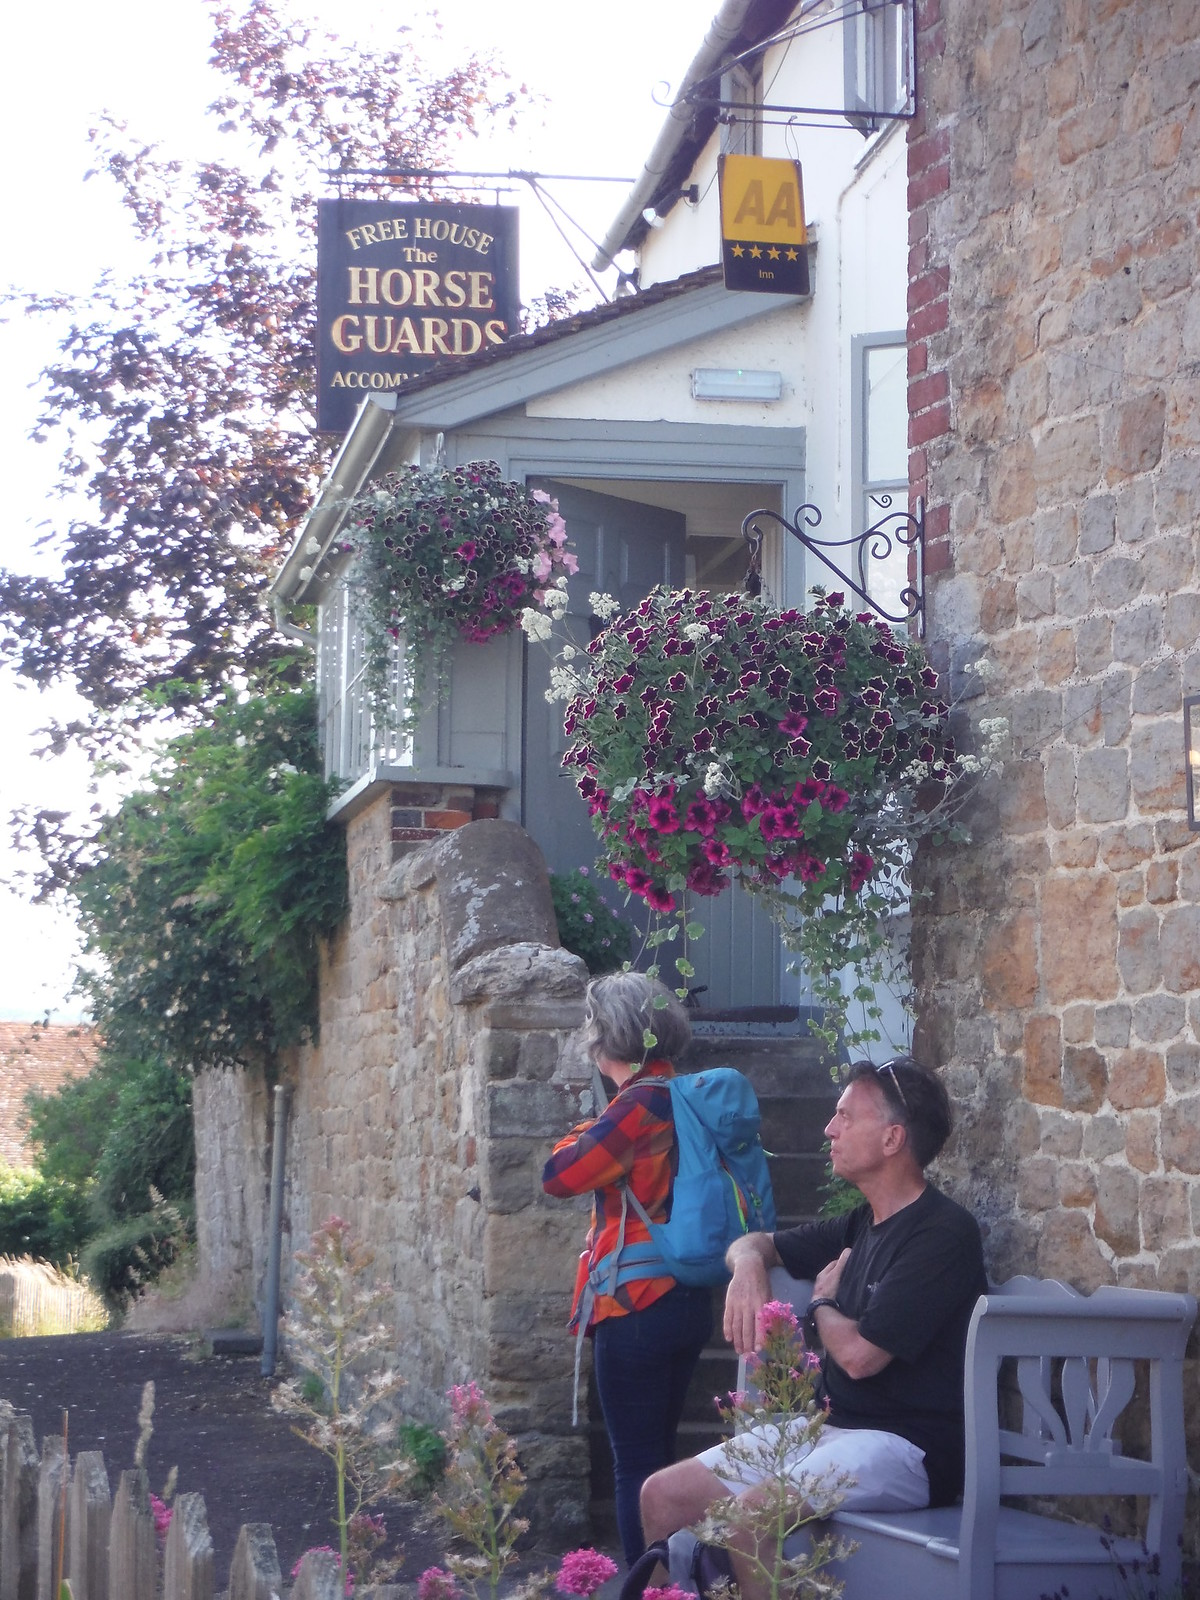 The Horse Guards Inn, Tillington SWC Walk 217 Midhurst Way: Arundel to Midhurst